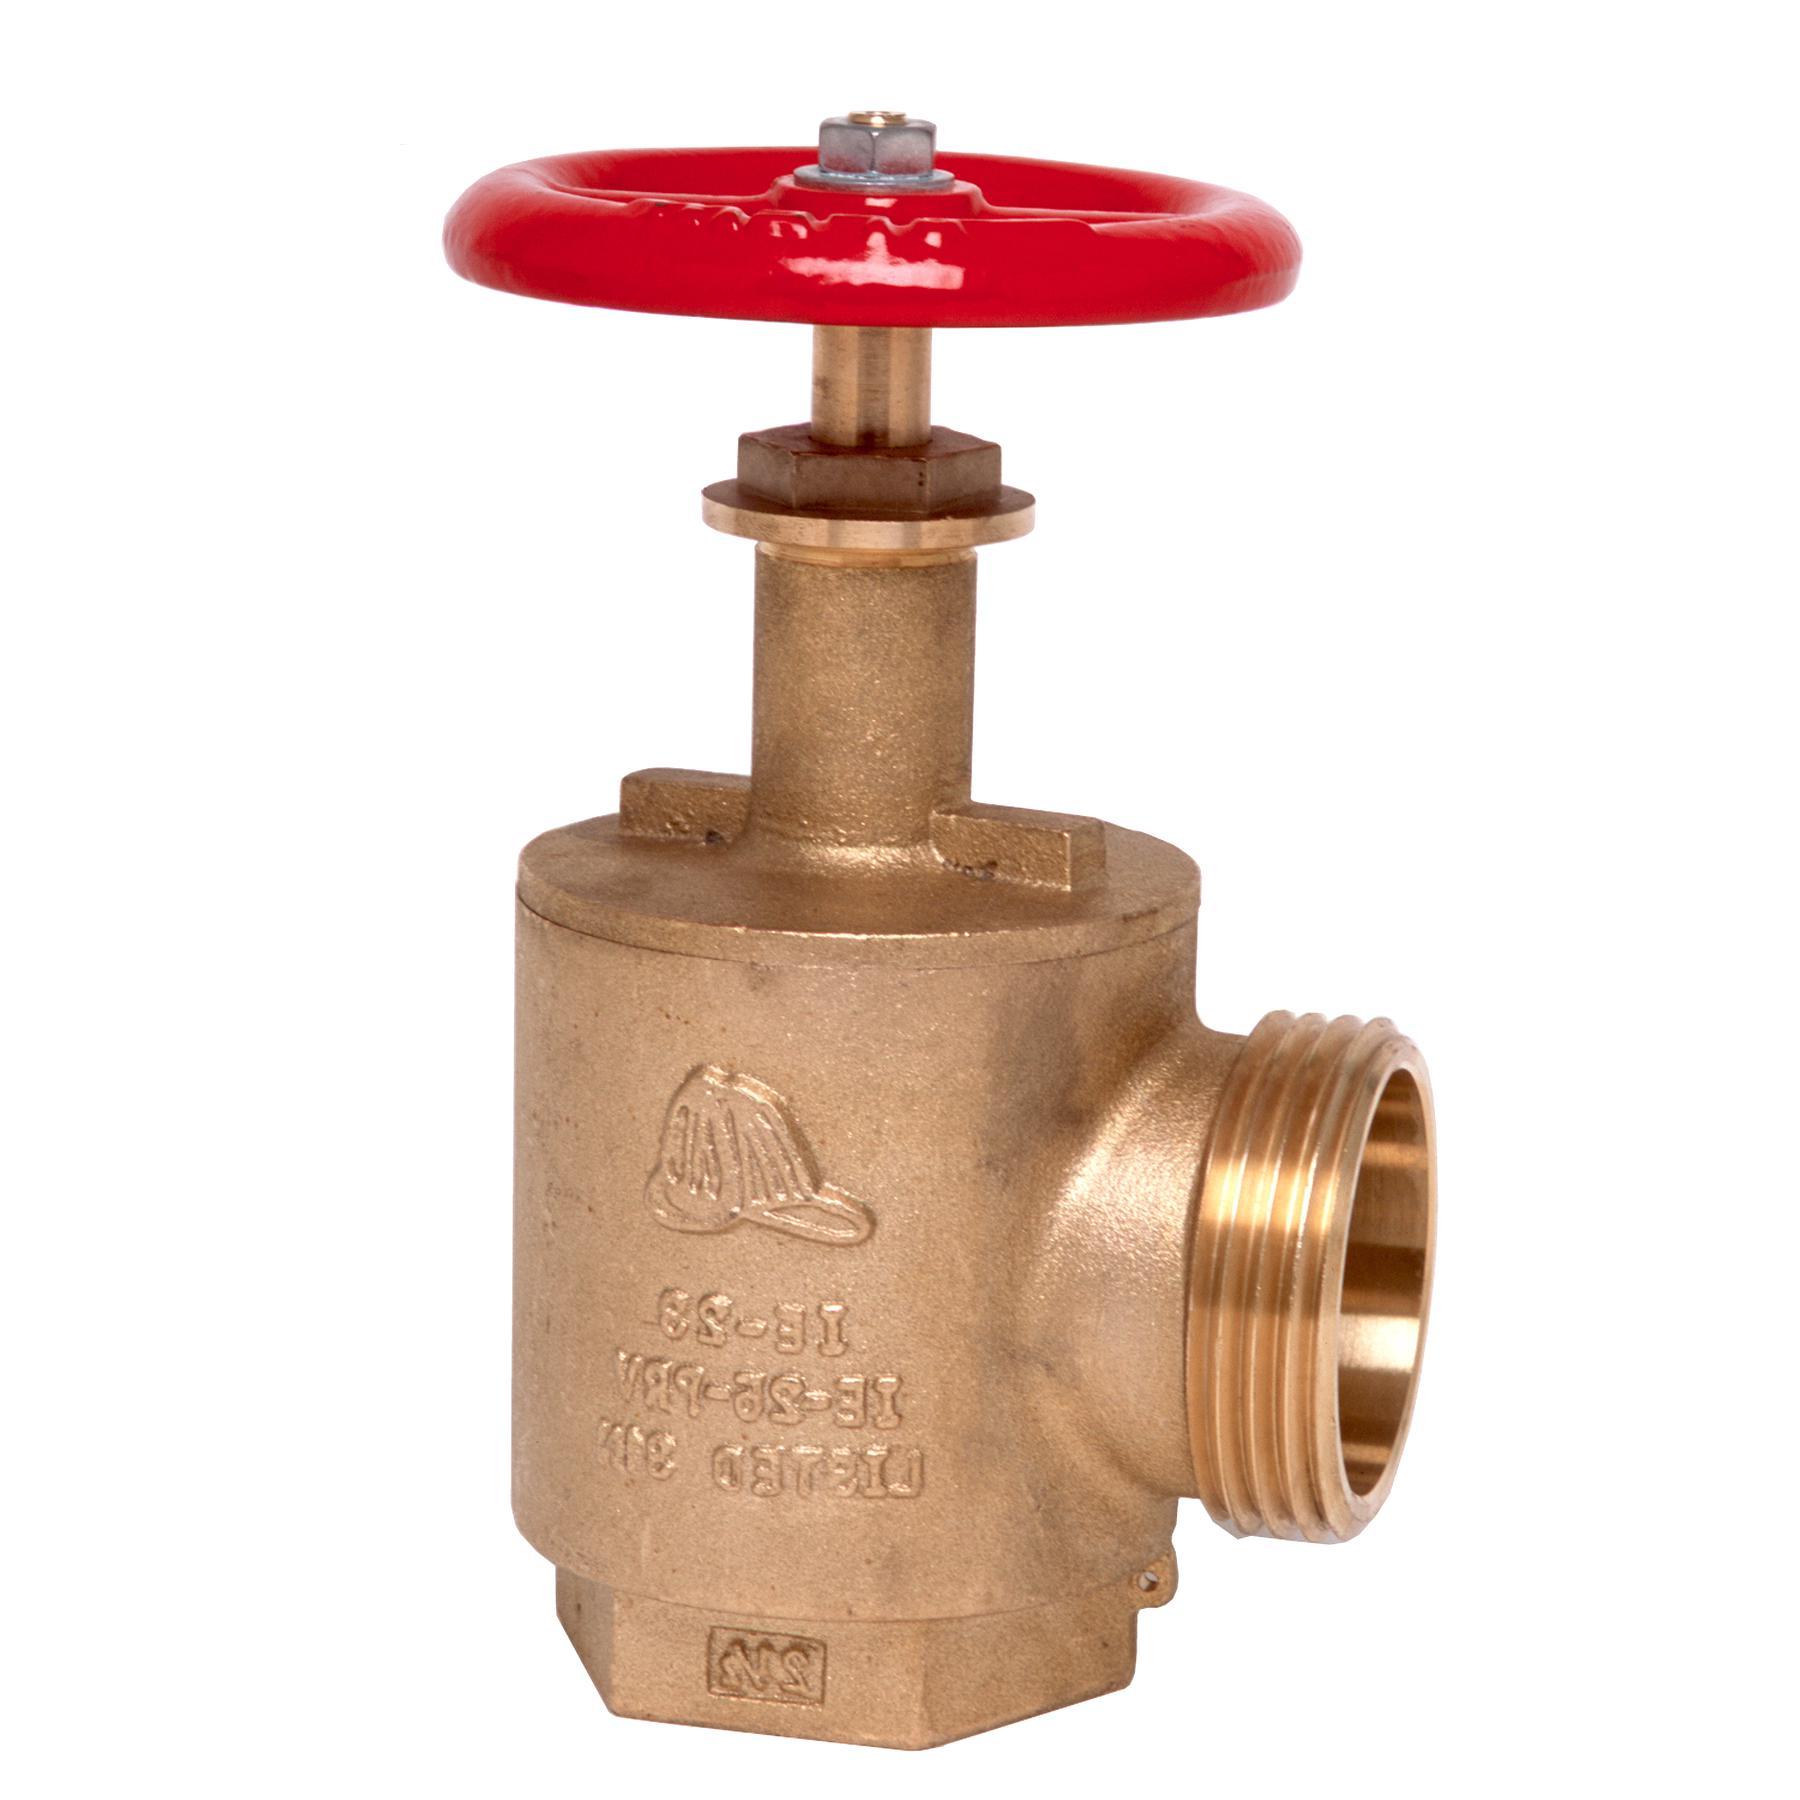 fire hose valve for sale